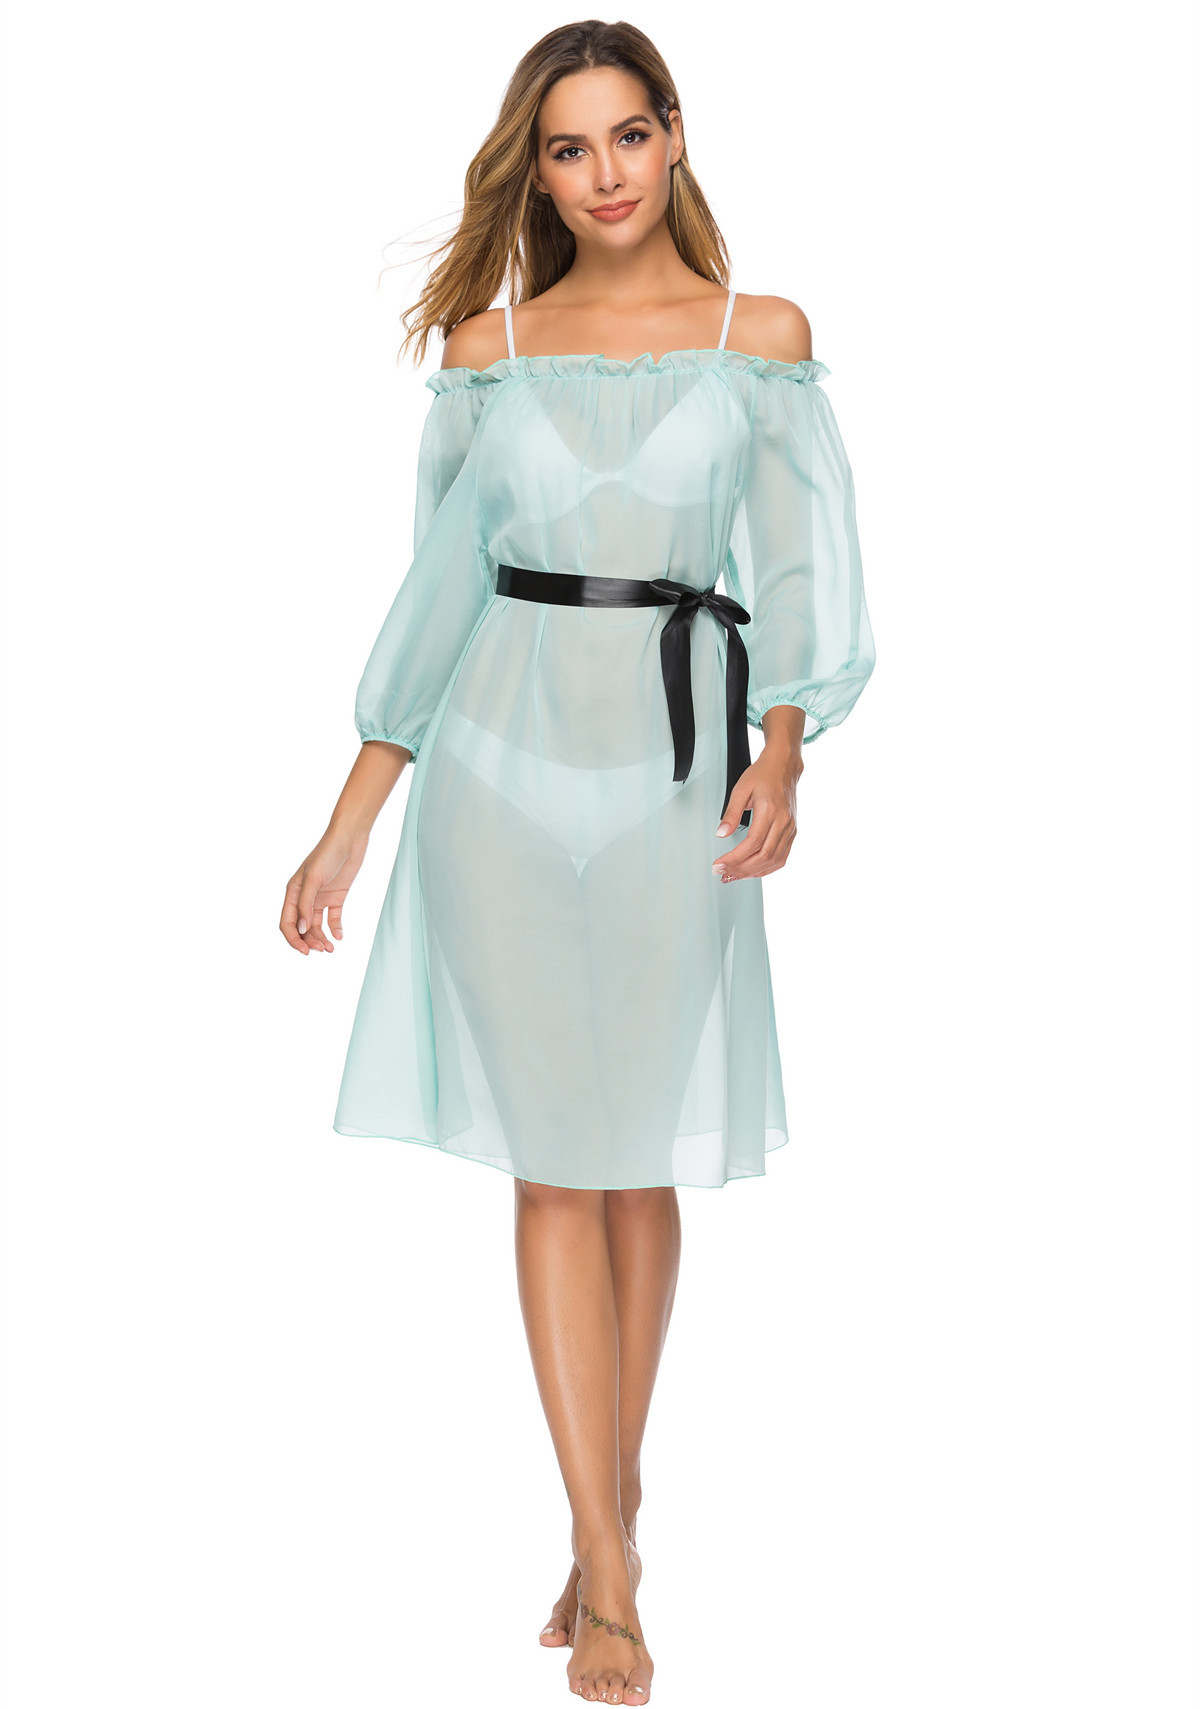 2019 New Style Horizontal Neck Flounced Chiffon Dress Europe And America Of Belt Beach Skirt